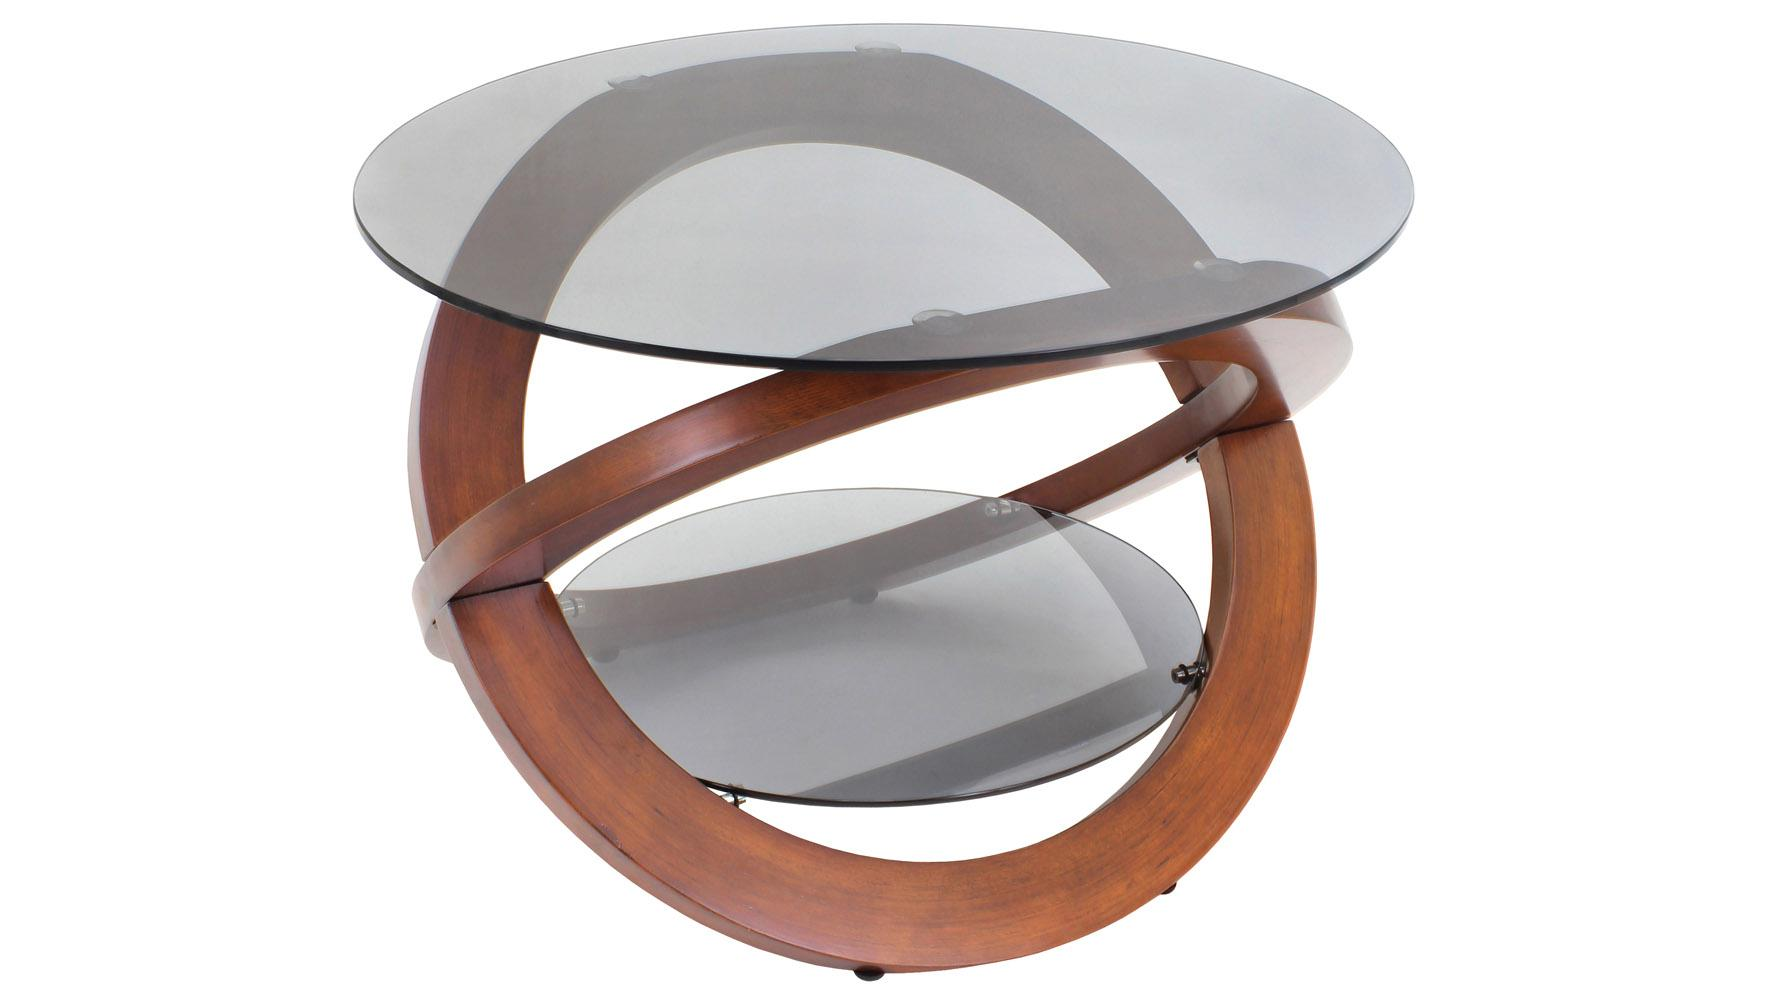 modern glass coffee table designs photo - 10